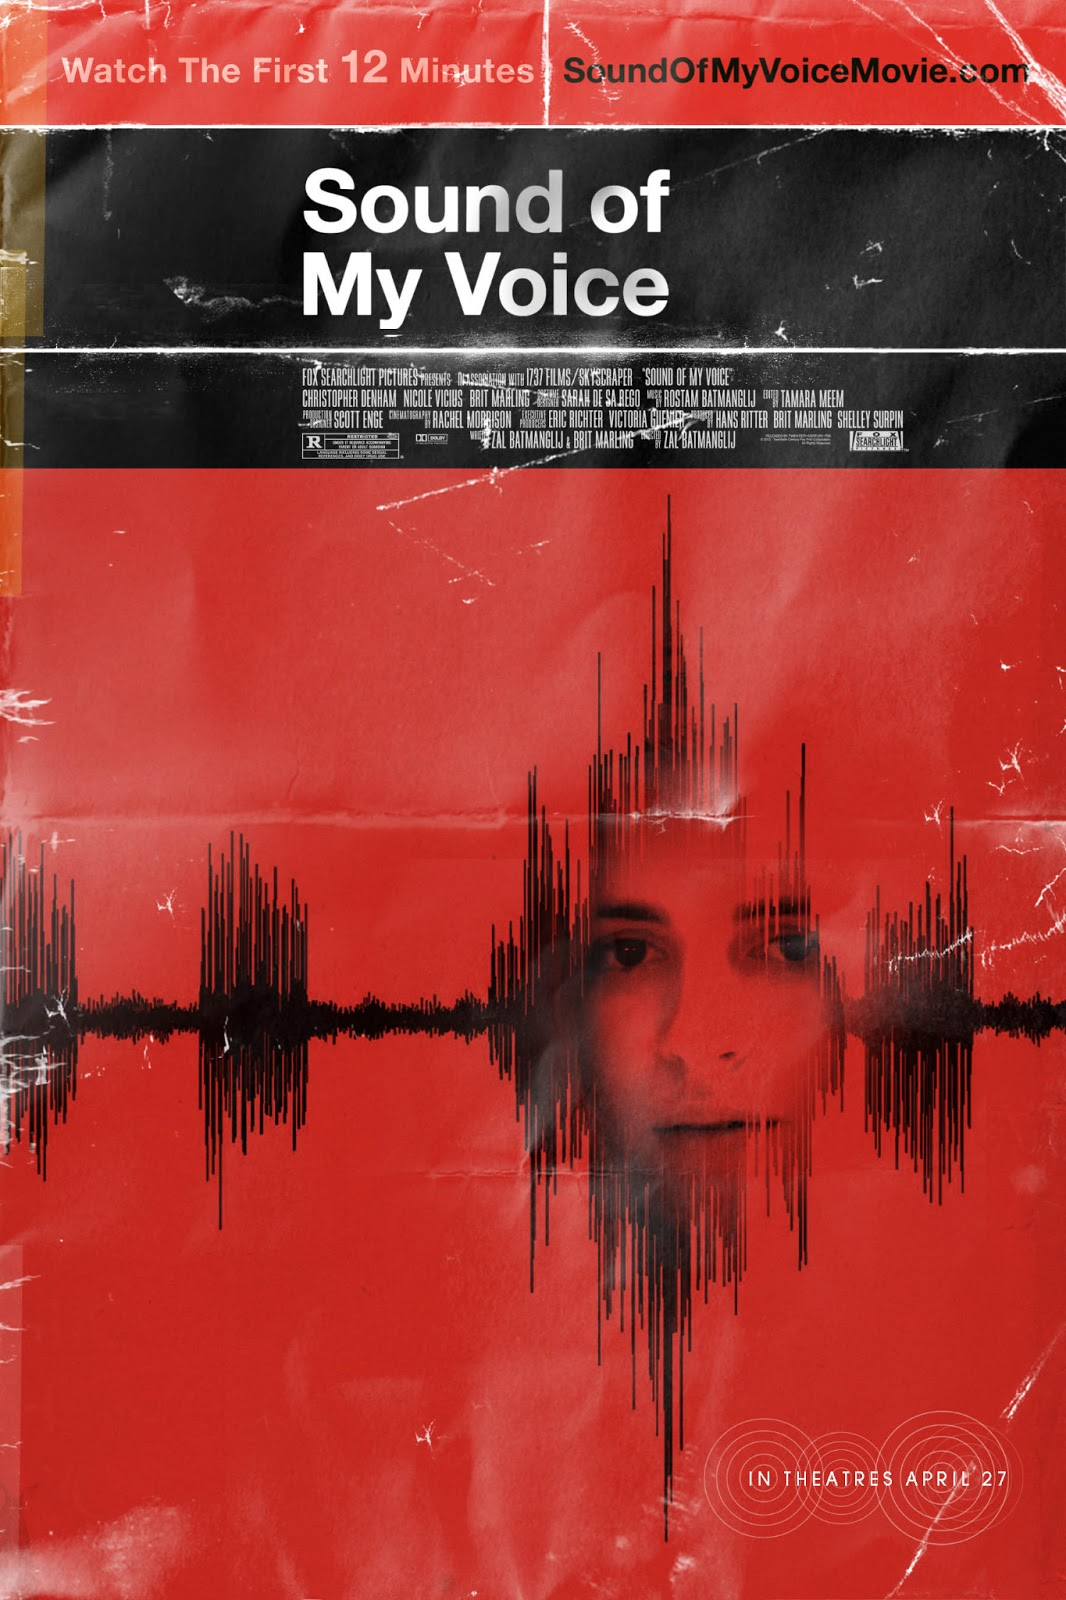 Sectas  - Página 6 Sound%2Bof%2Bmy%2Bvoice%2Bposter